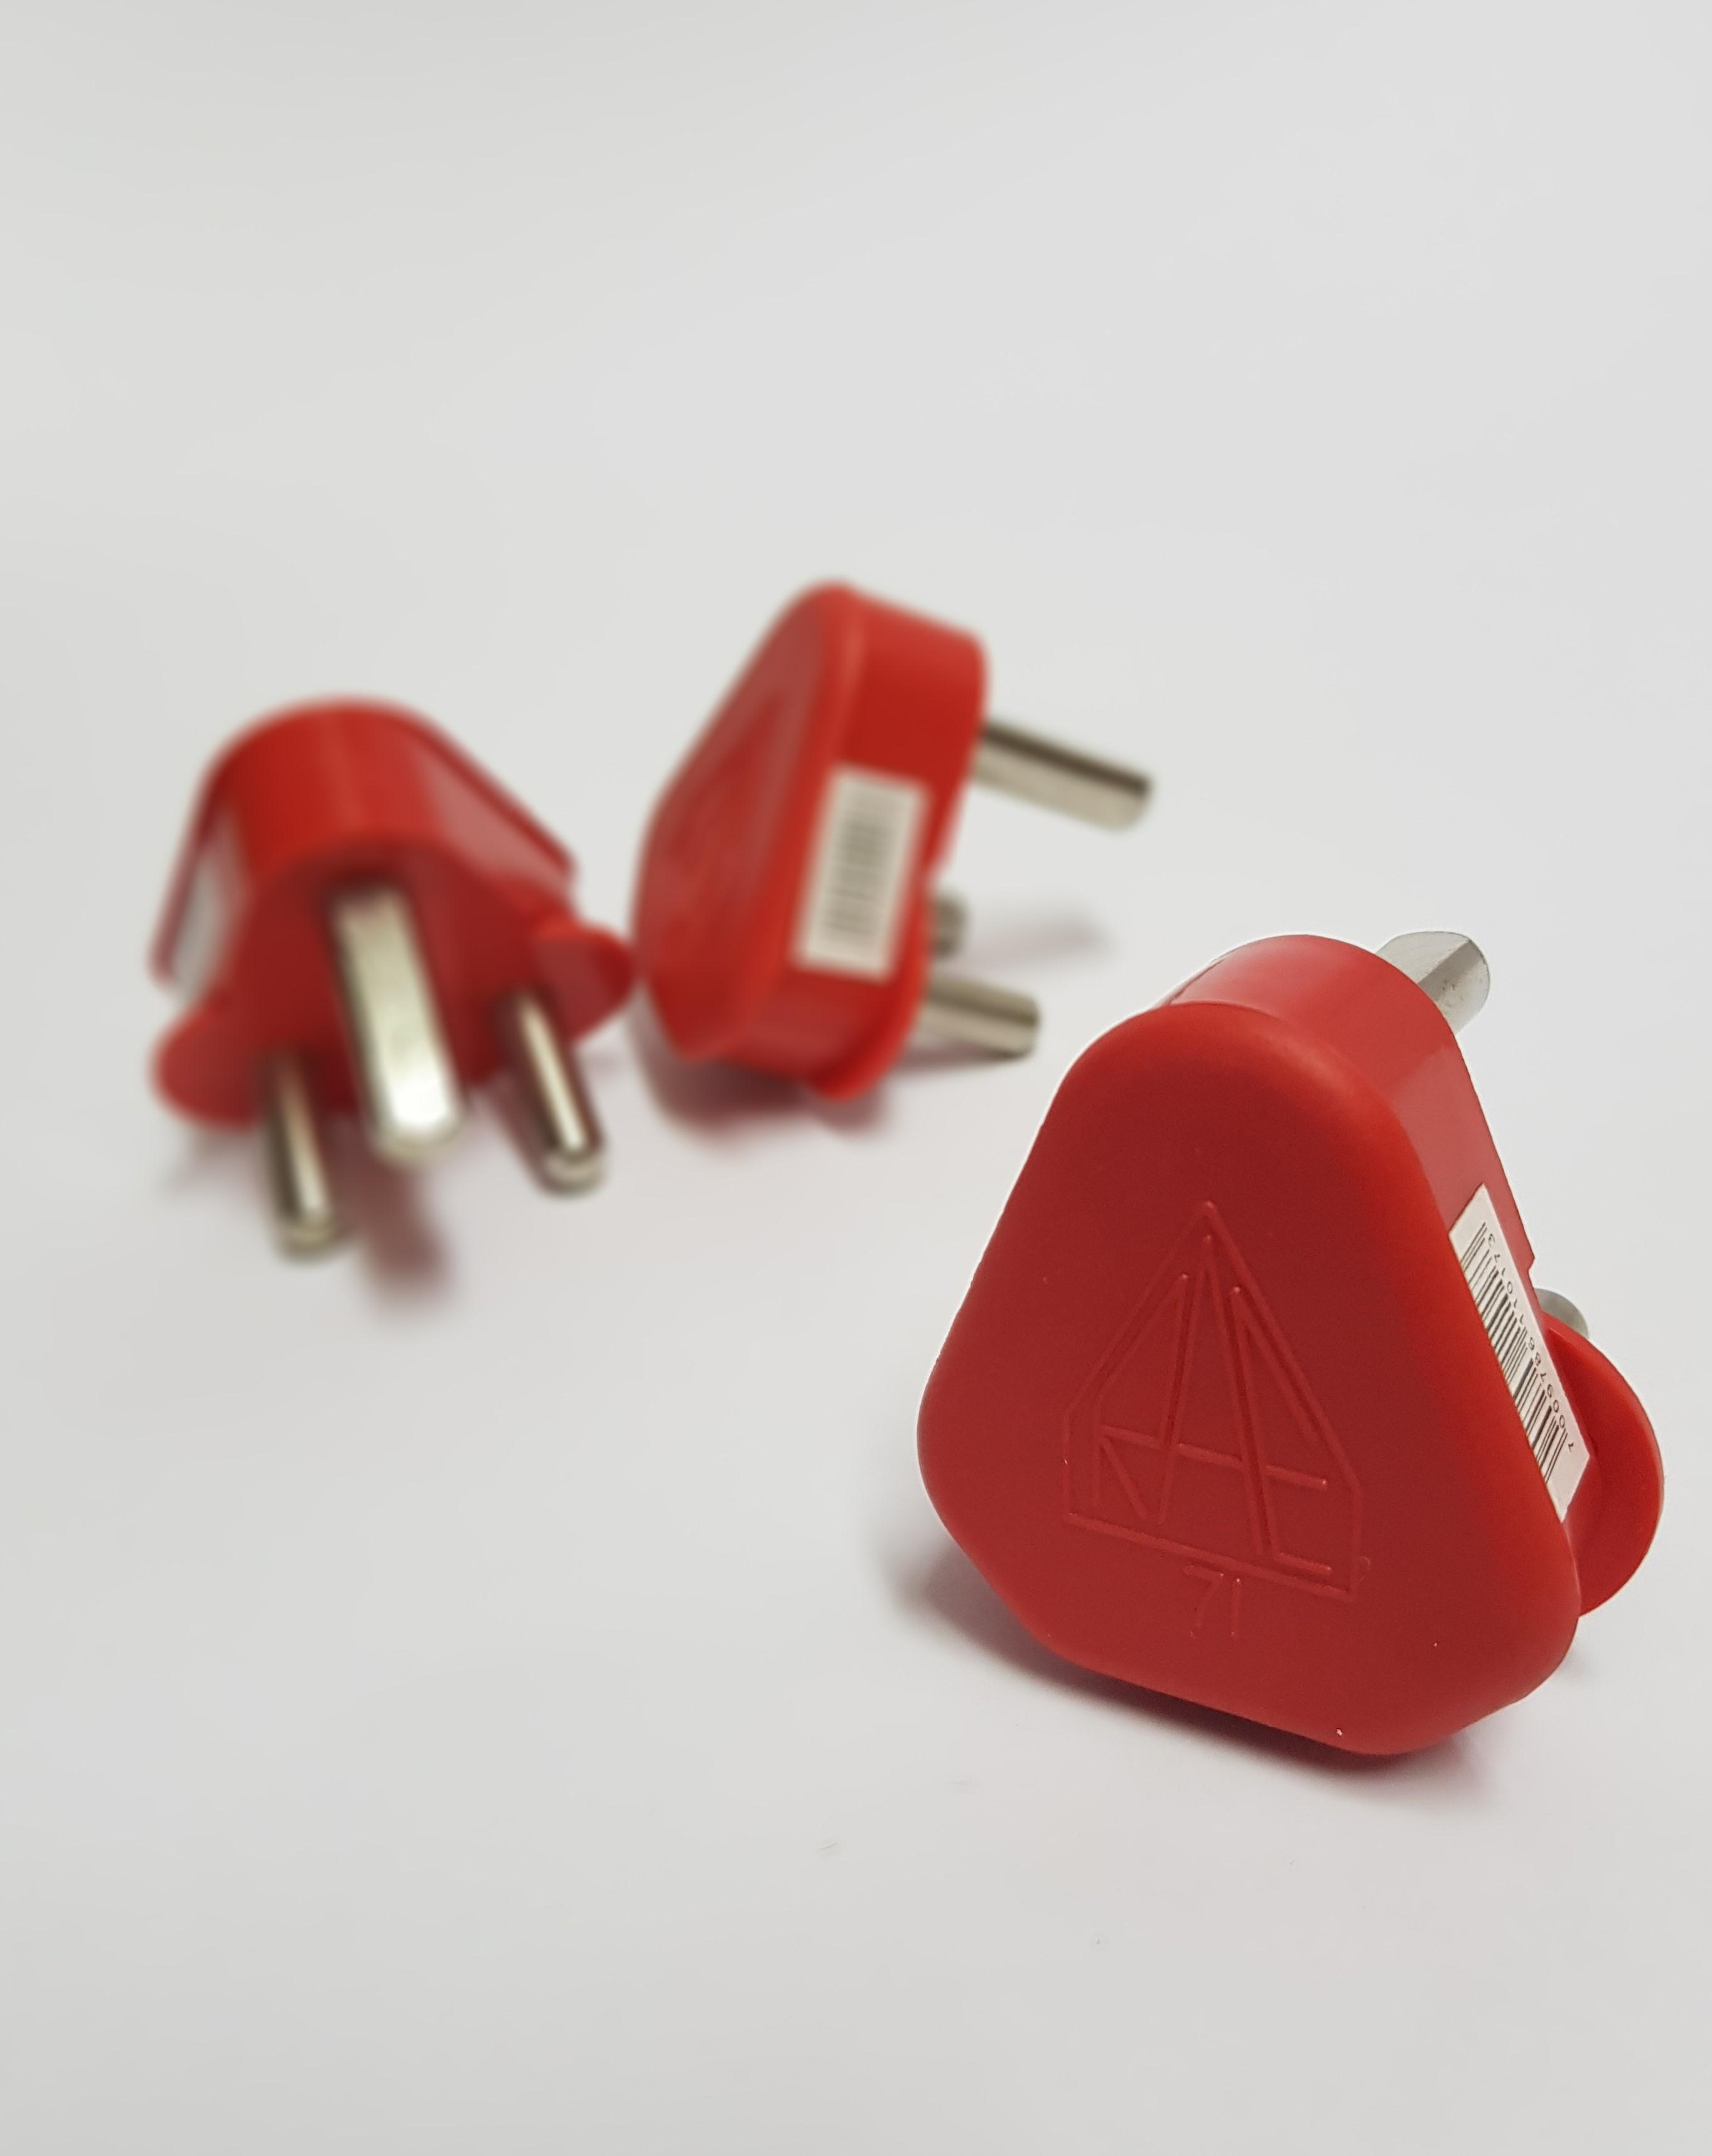 3 Pin Plug  Dedicated  Red  U2013 Sircony